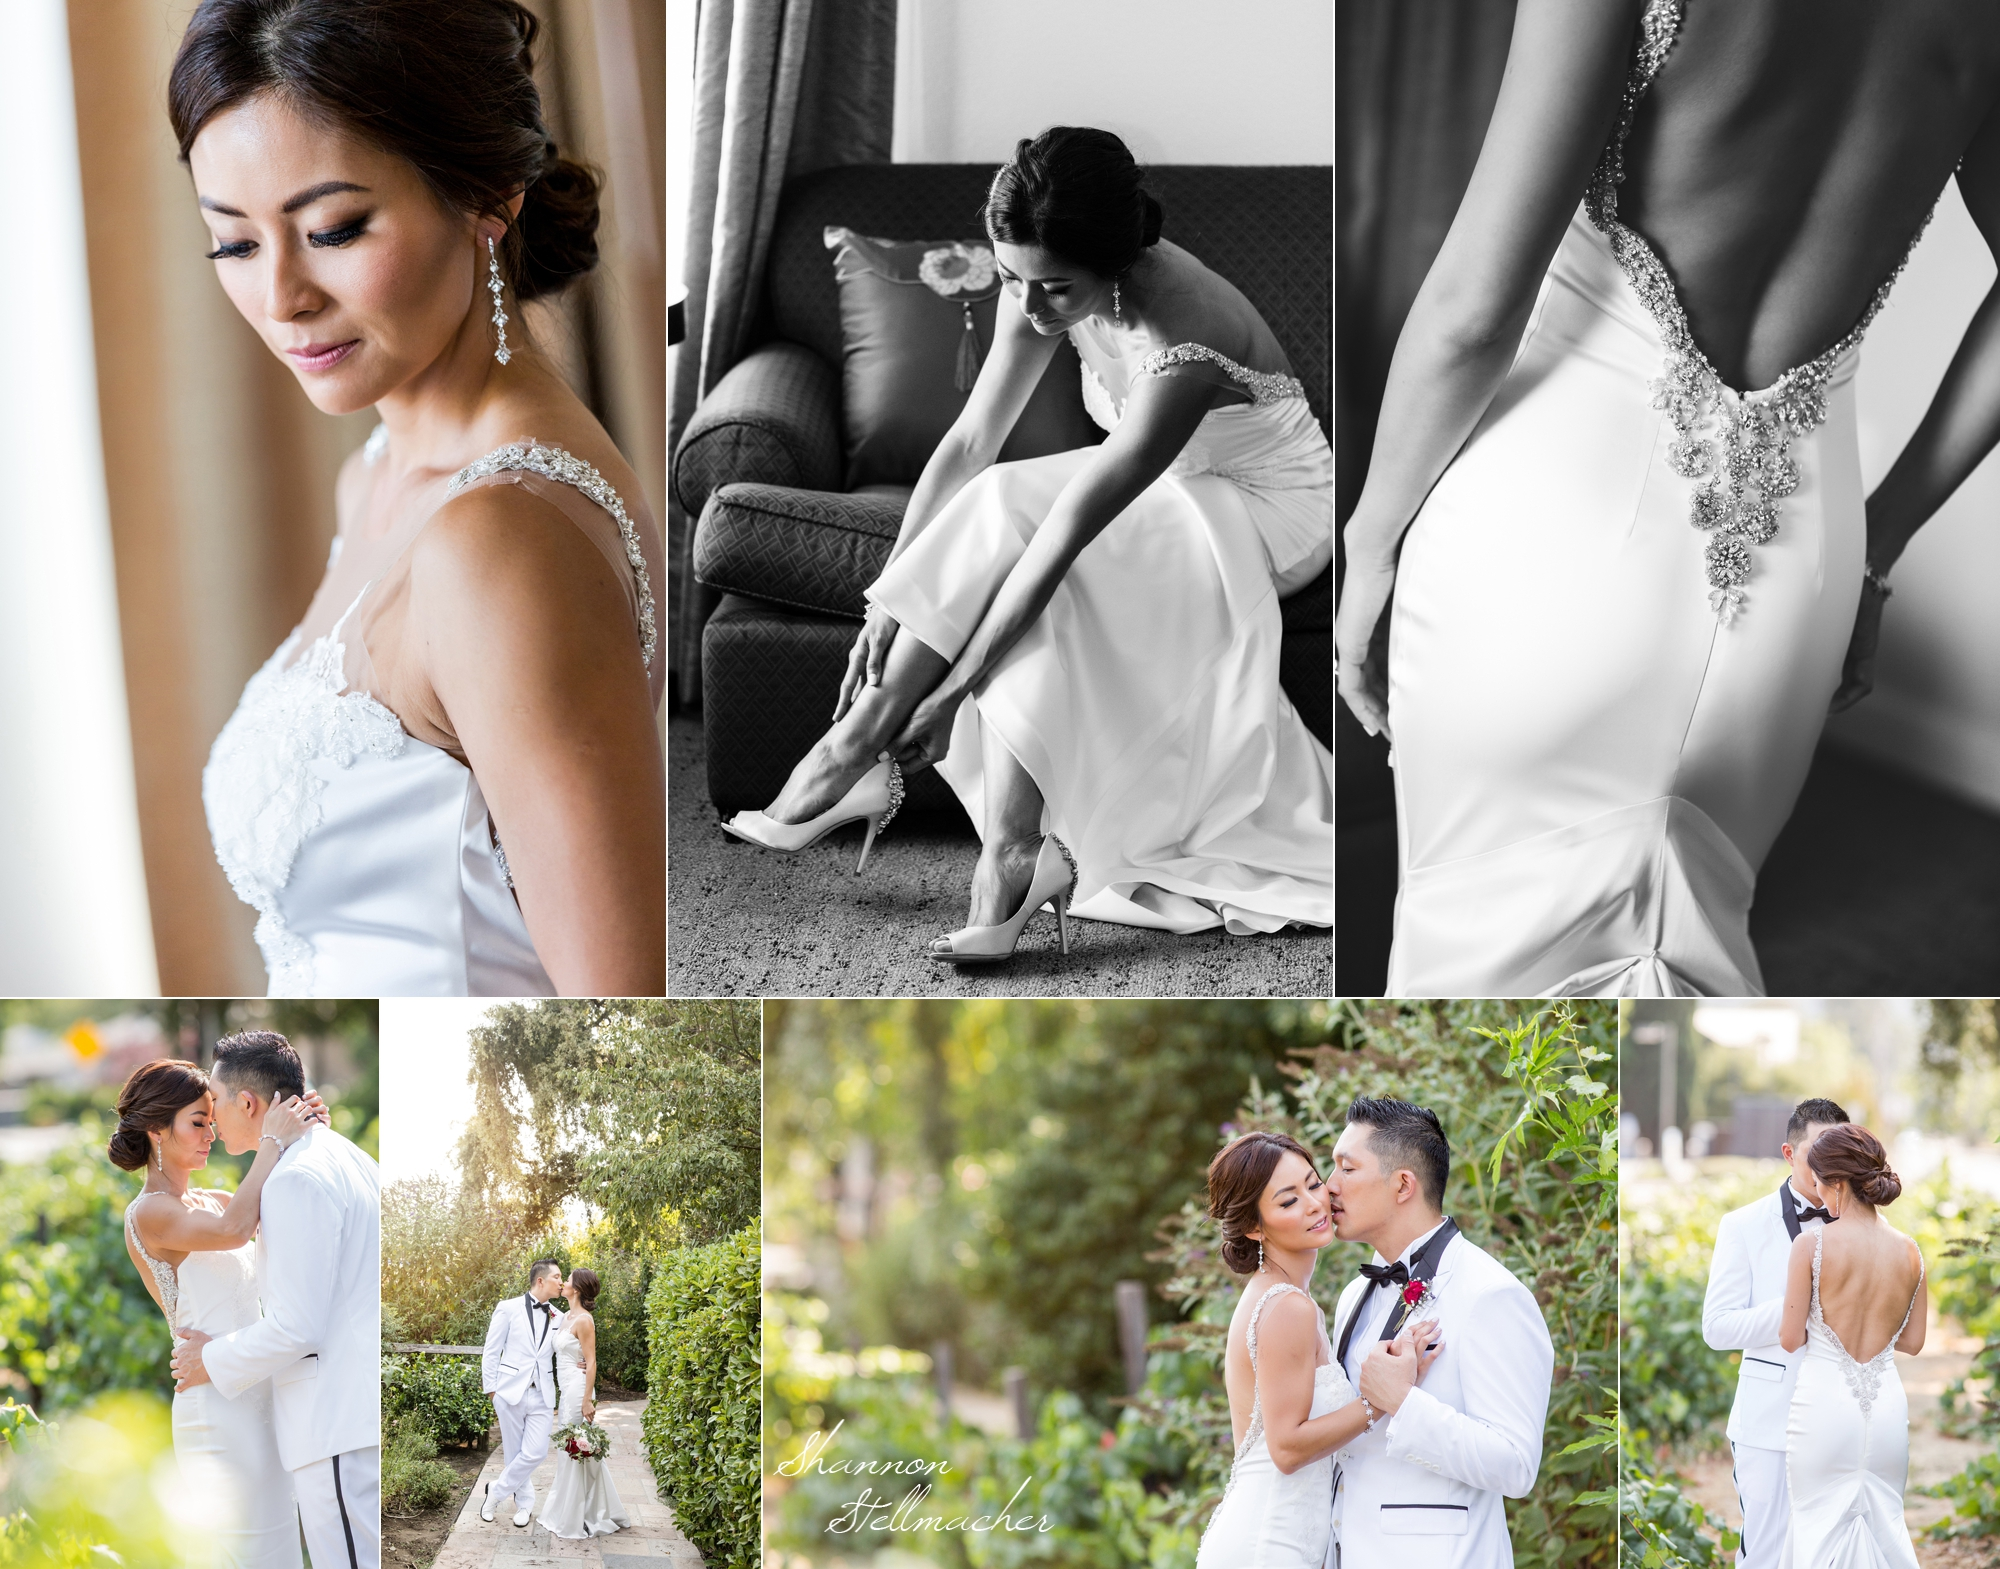 V. Sattui Wedding Camy and Vincent 2.jpg